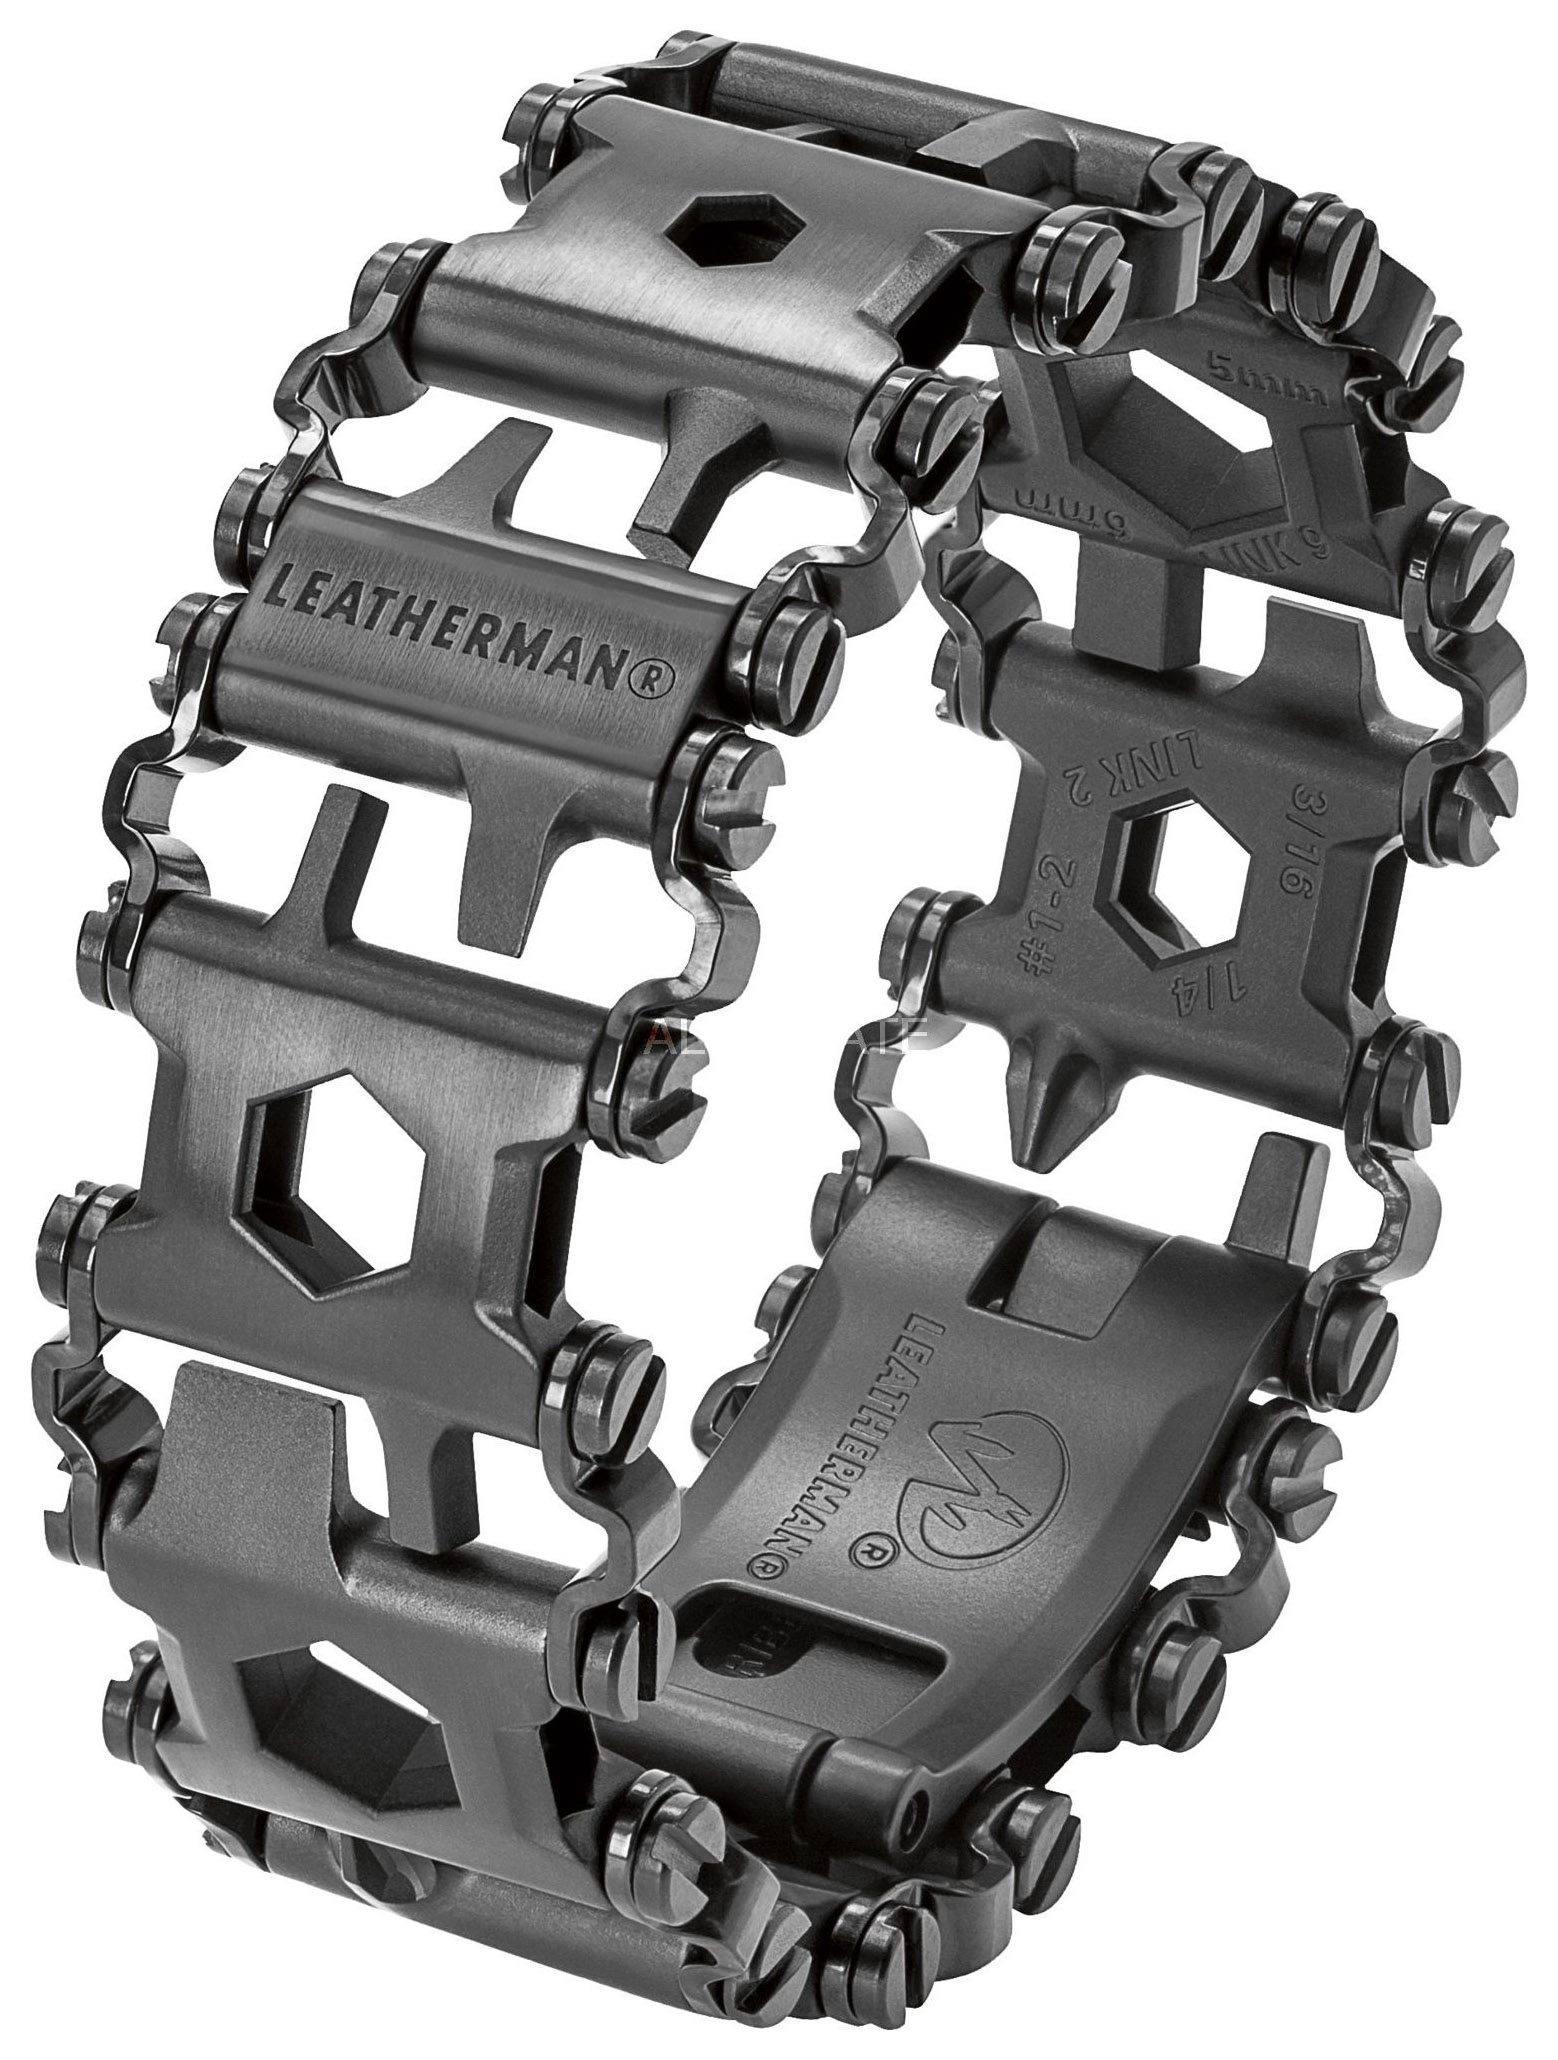 Браслет-мультитул Leatherman Tread 832324 160 мм черный, 29 функций